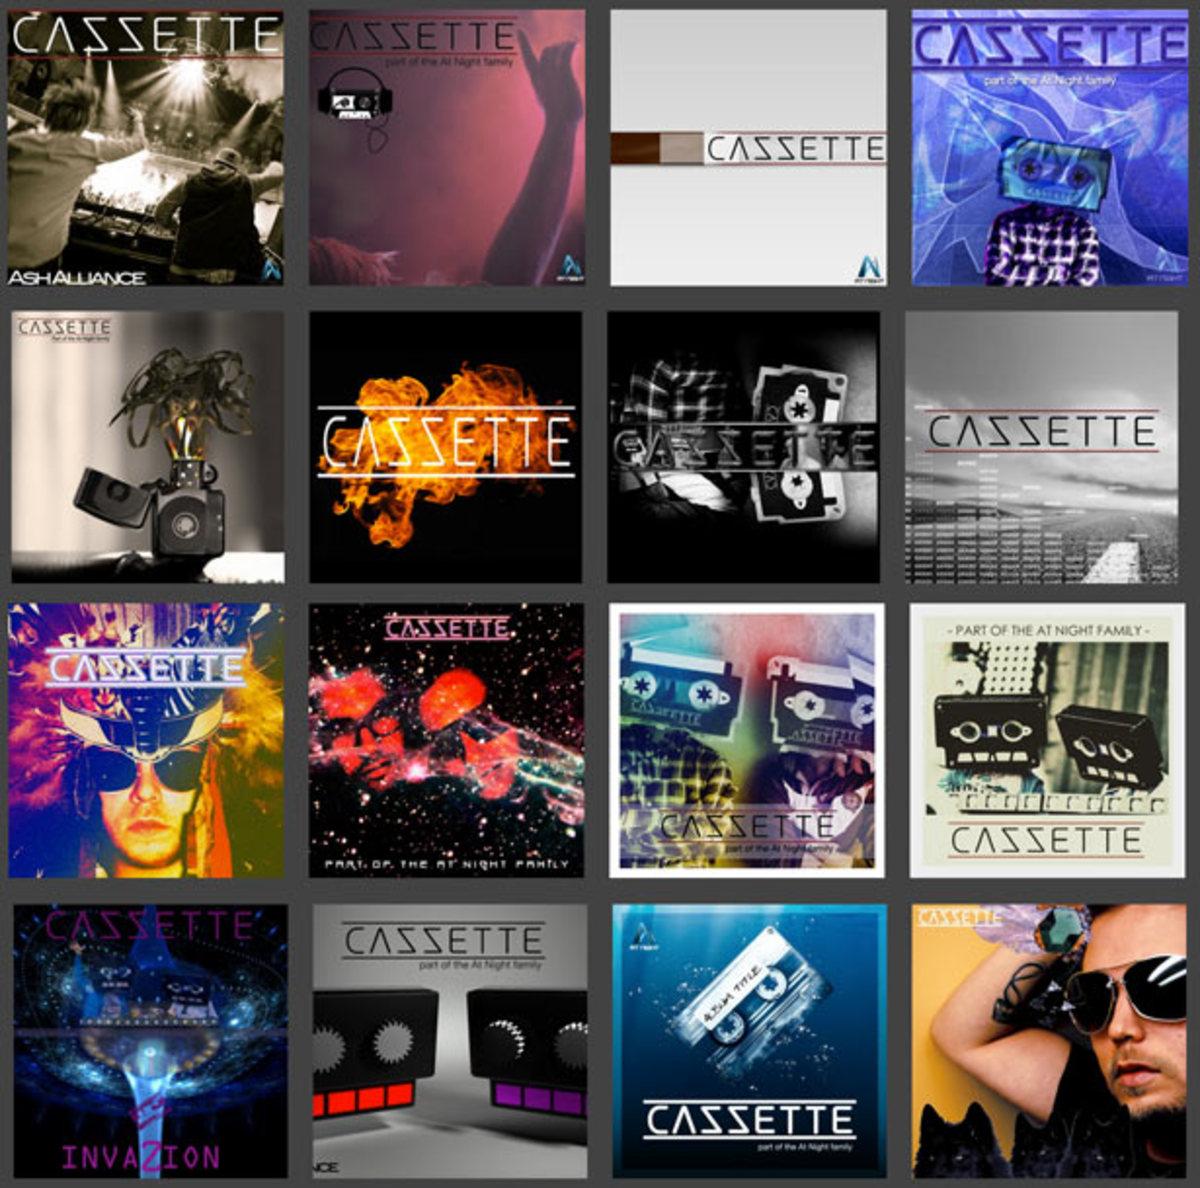 cazzette-album-cover